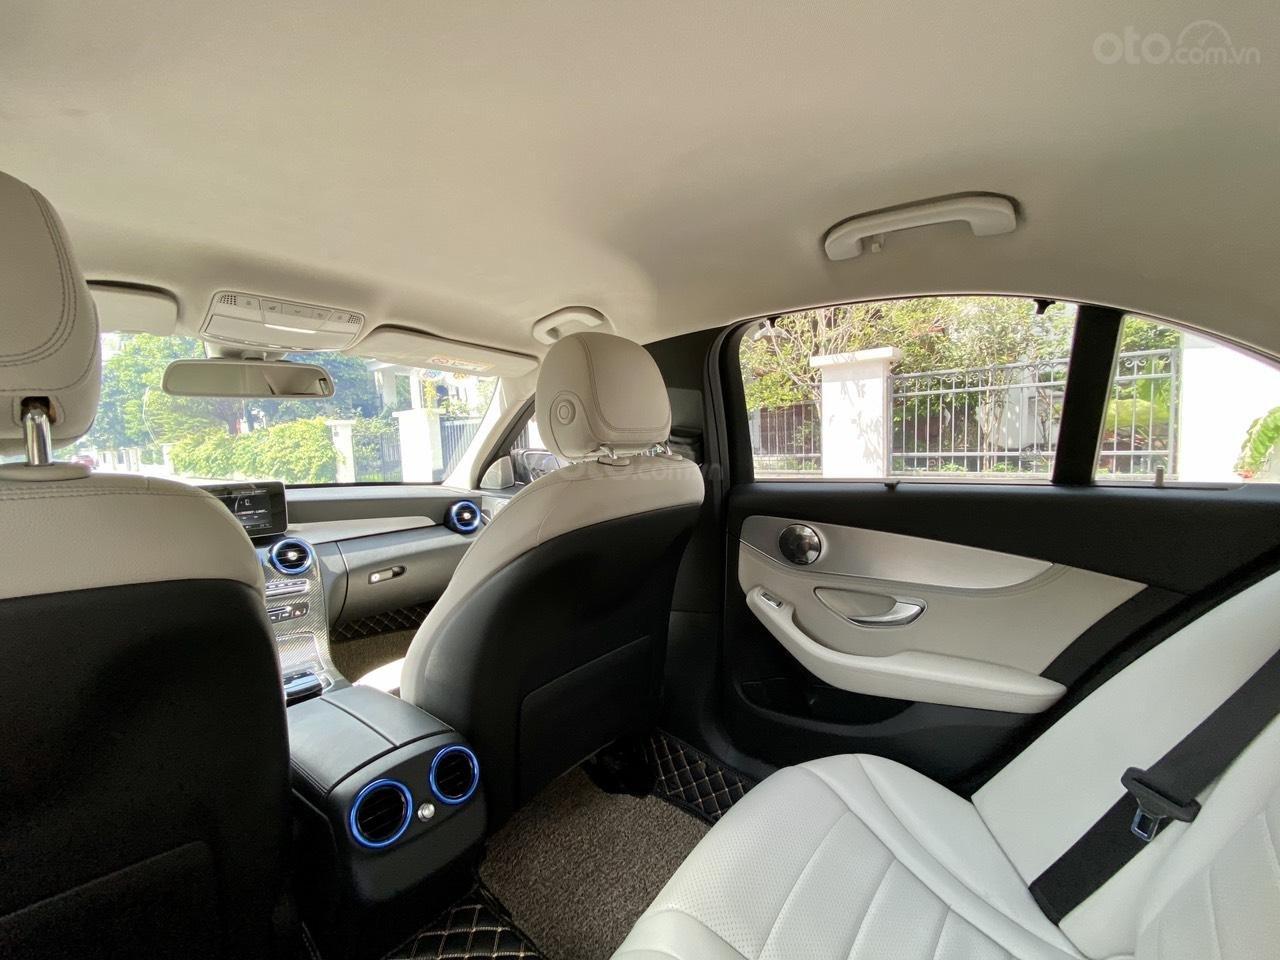 Mercedes C200 sx 2015, đk 2016, màu đen, nội thất kem (12)